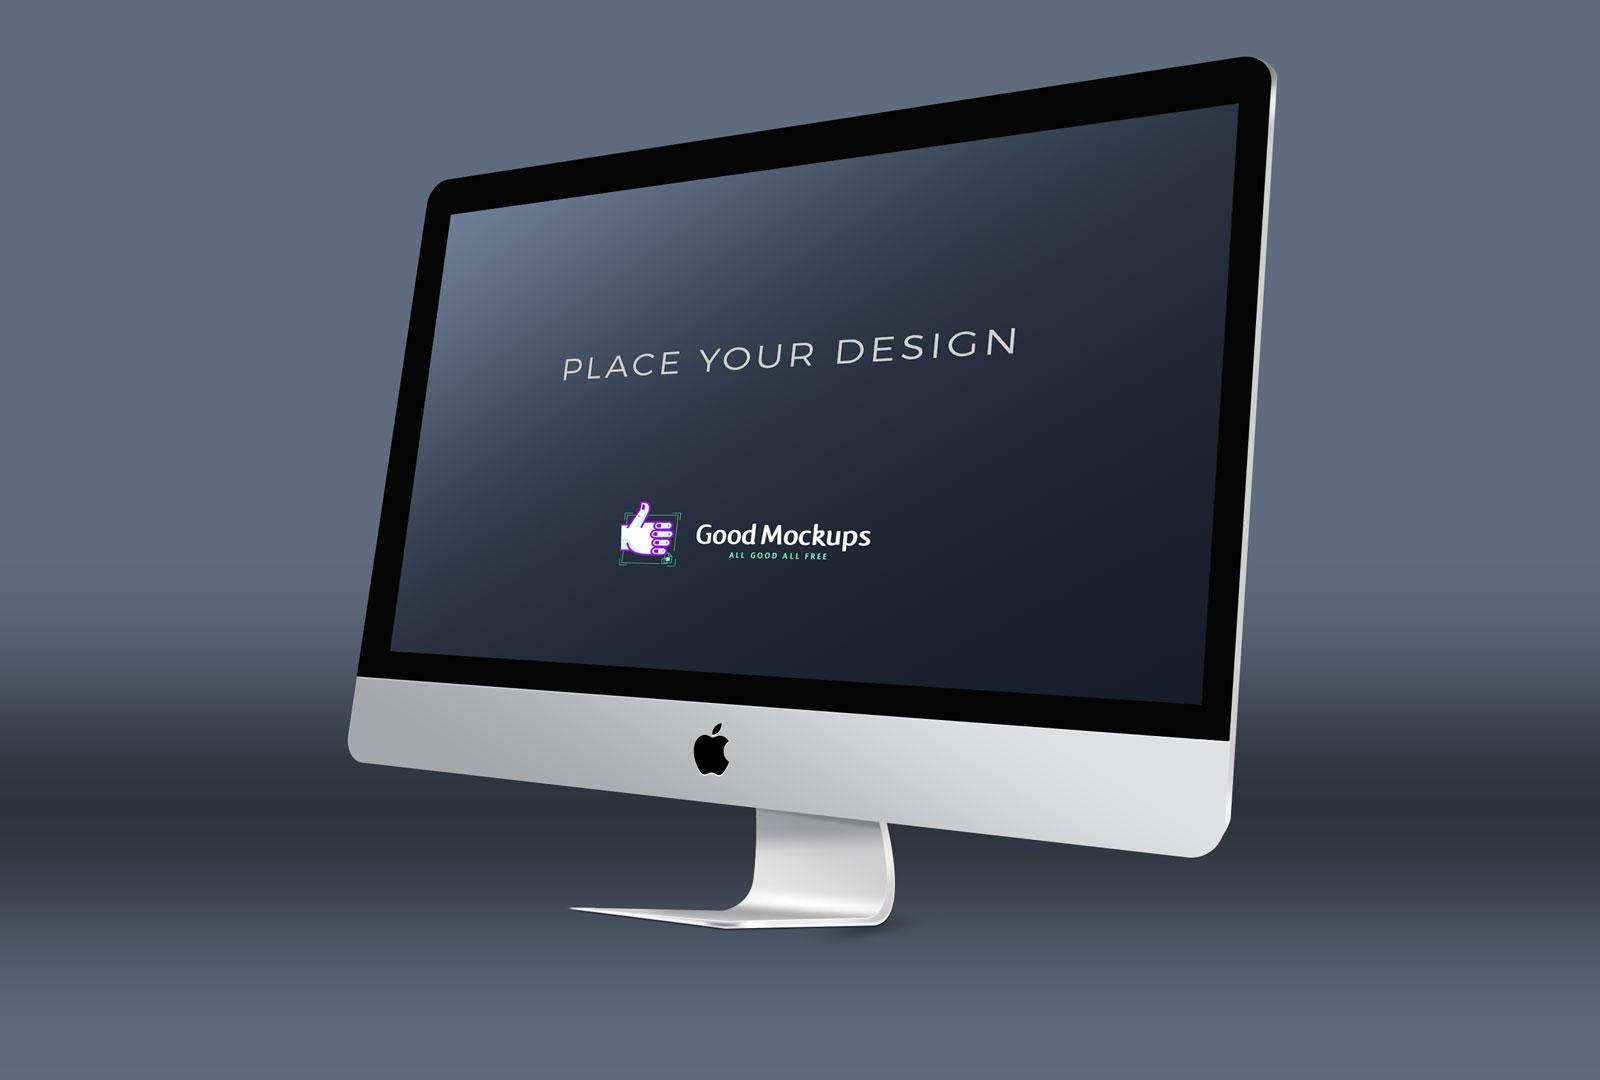 Free-Apple-iMac-Mockup-PSD-Template-3